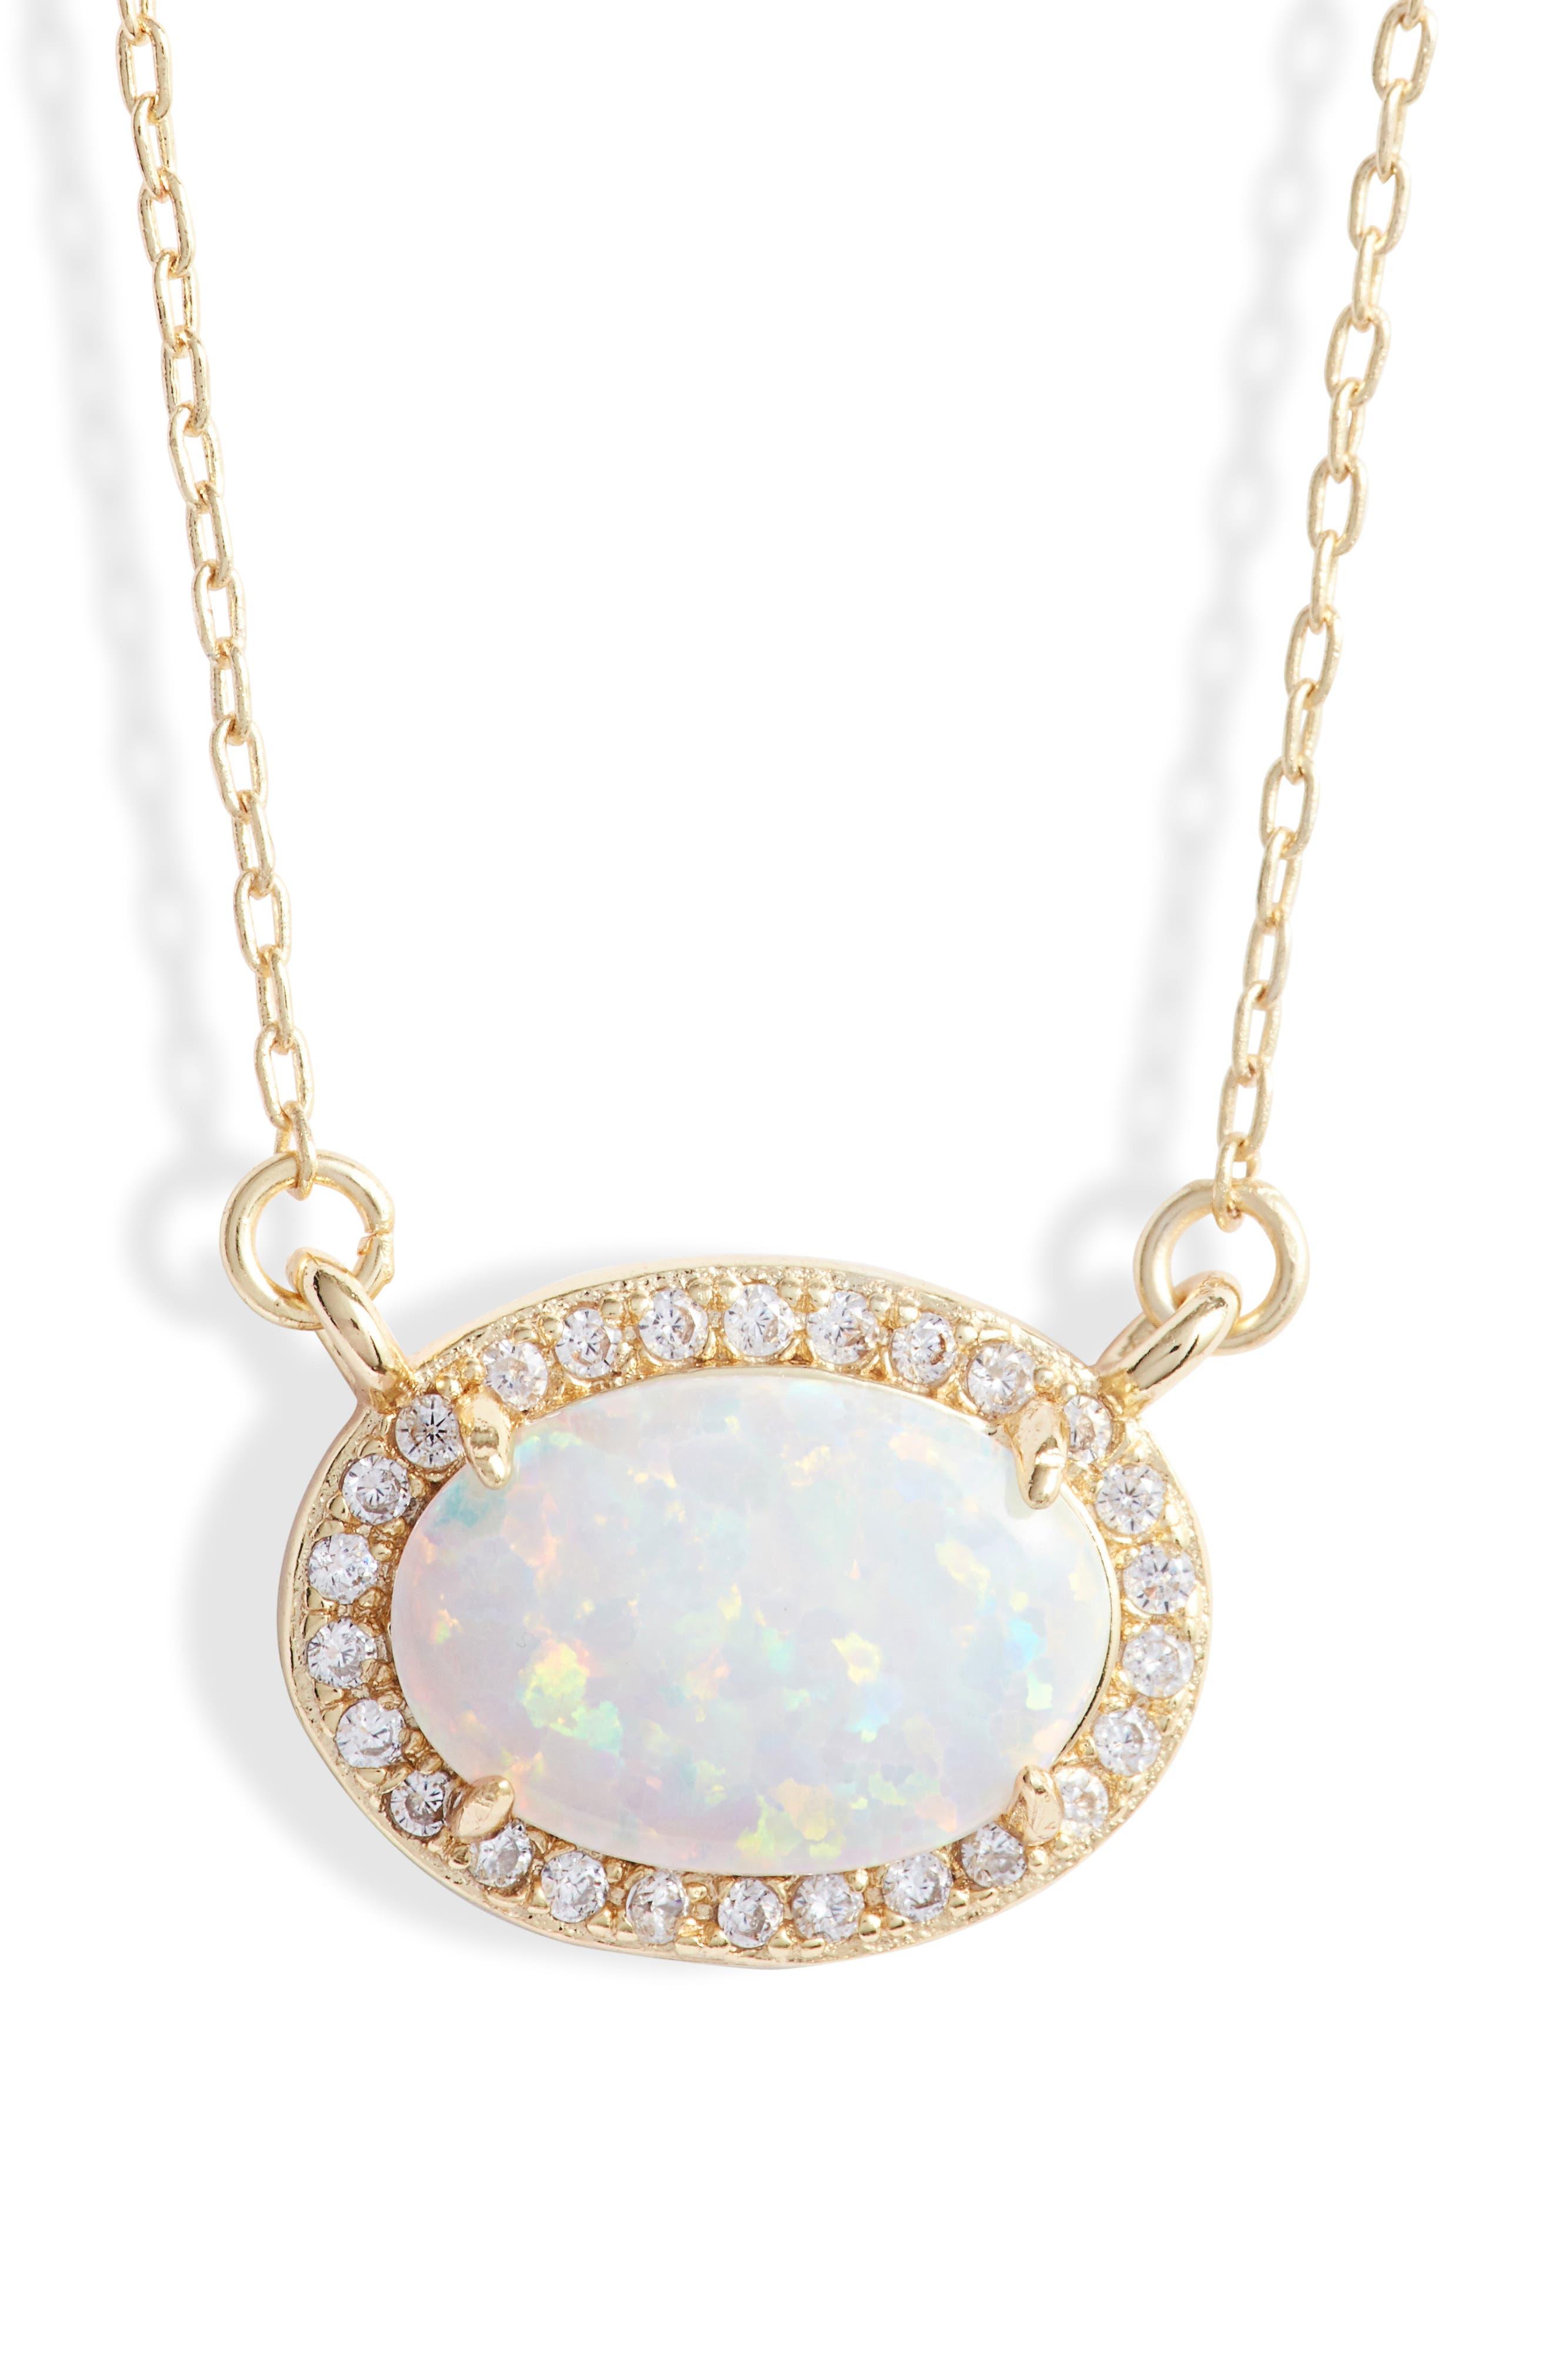 MELINDA MARIA, Ciera Opal Pendant Necklace, Main thumbnail 1, color, 710